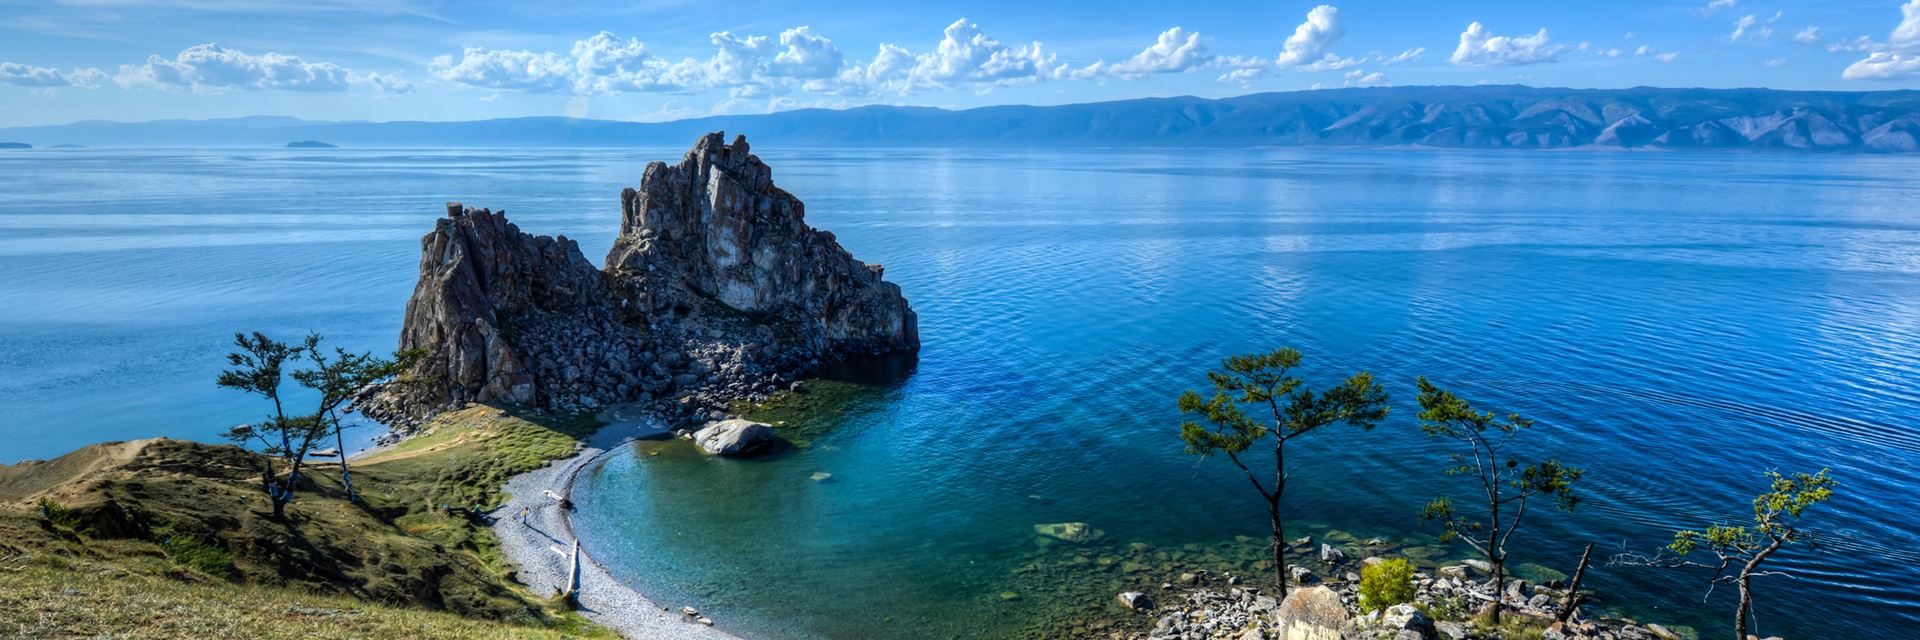 [Image: iStock471952853_Lake_Baikal_800c2400_new.jpg]